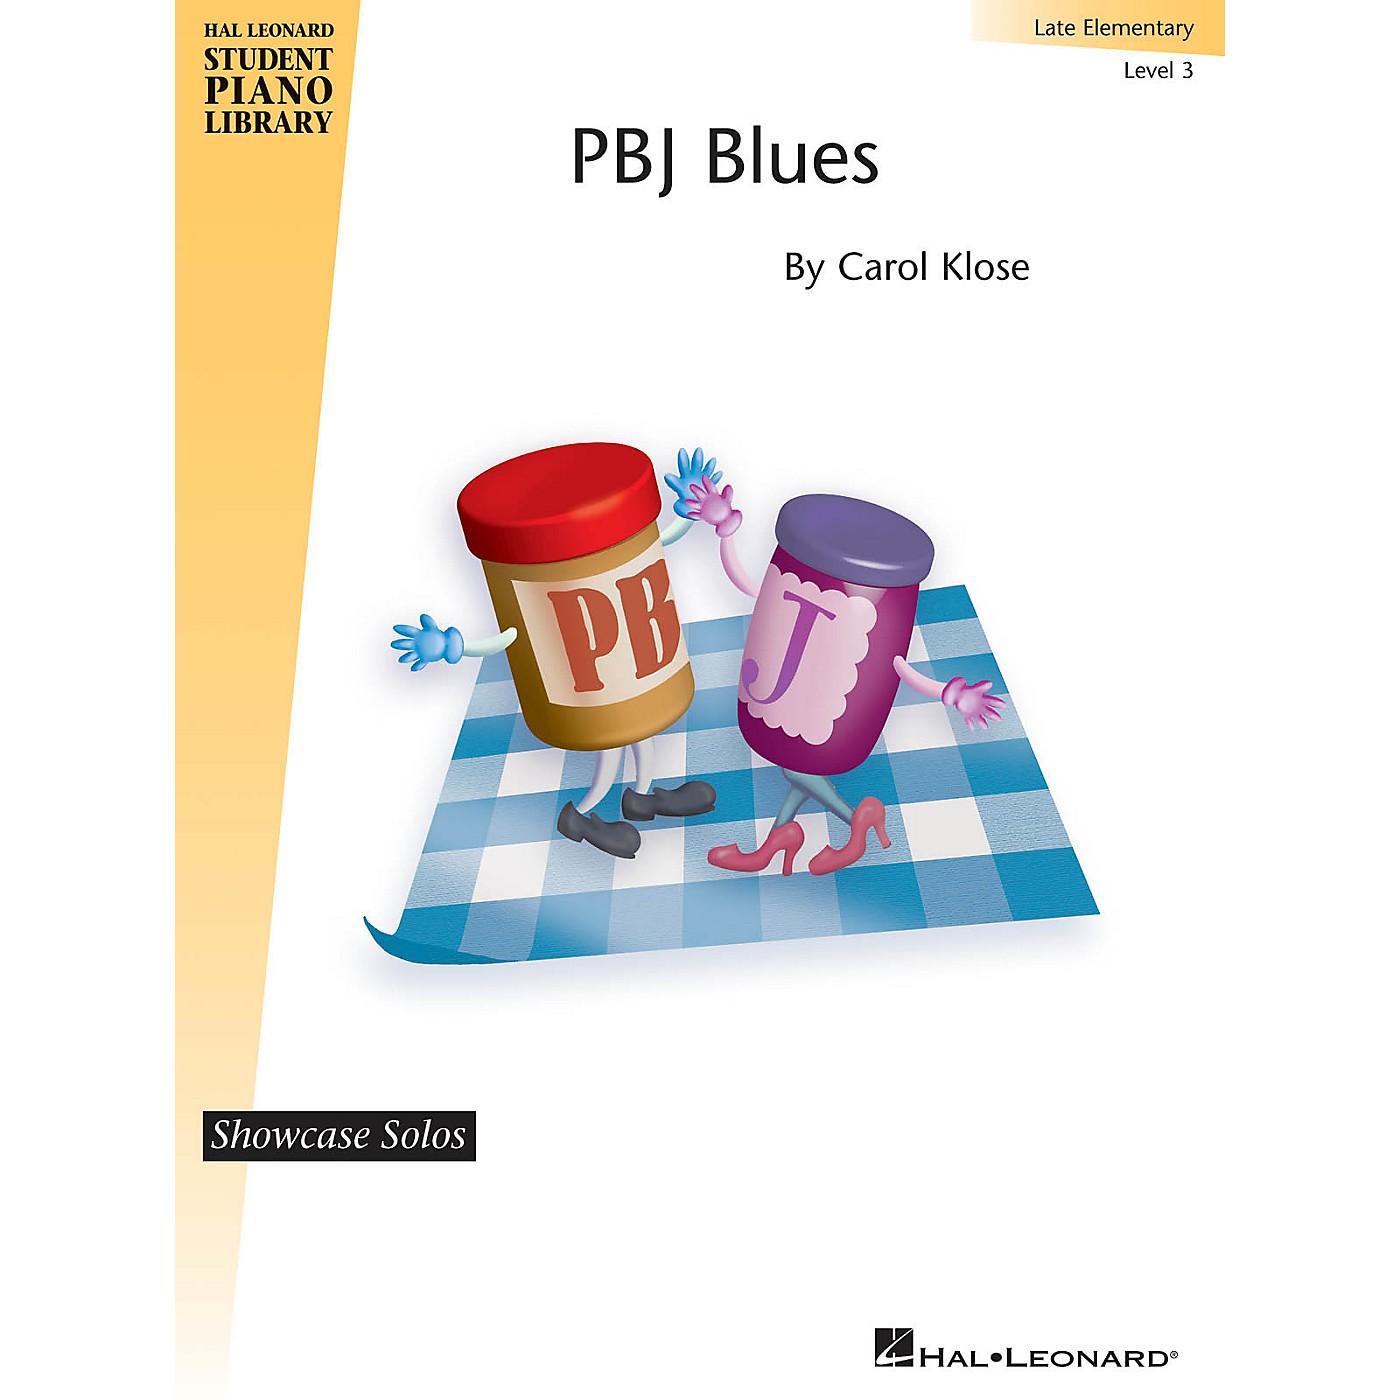 Hal Leonard PBJ Blues Piano Library Series by Carol Klose (Level Late Elem) thumbnail